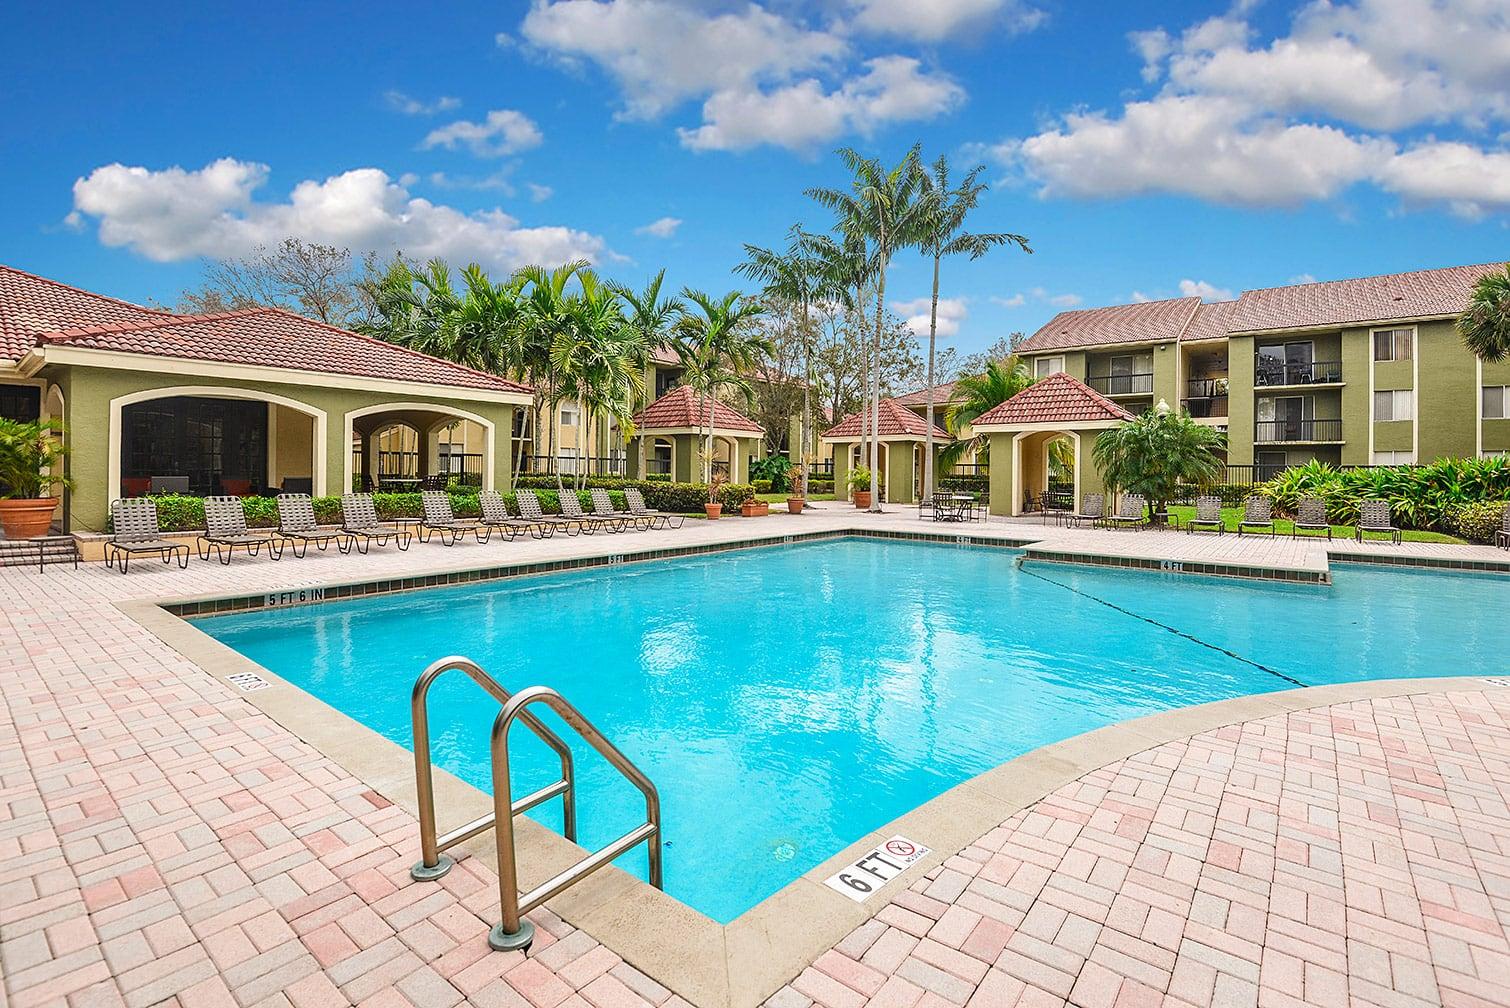 270 Sunshine, Coconut Creek, FL, 33066